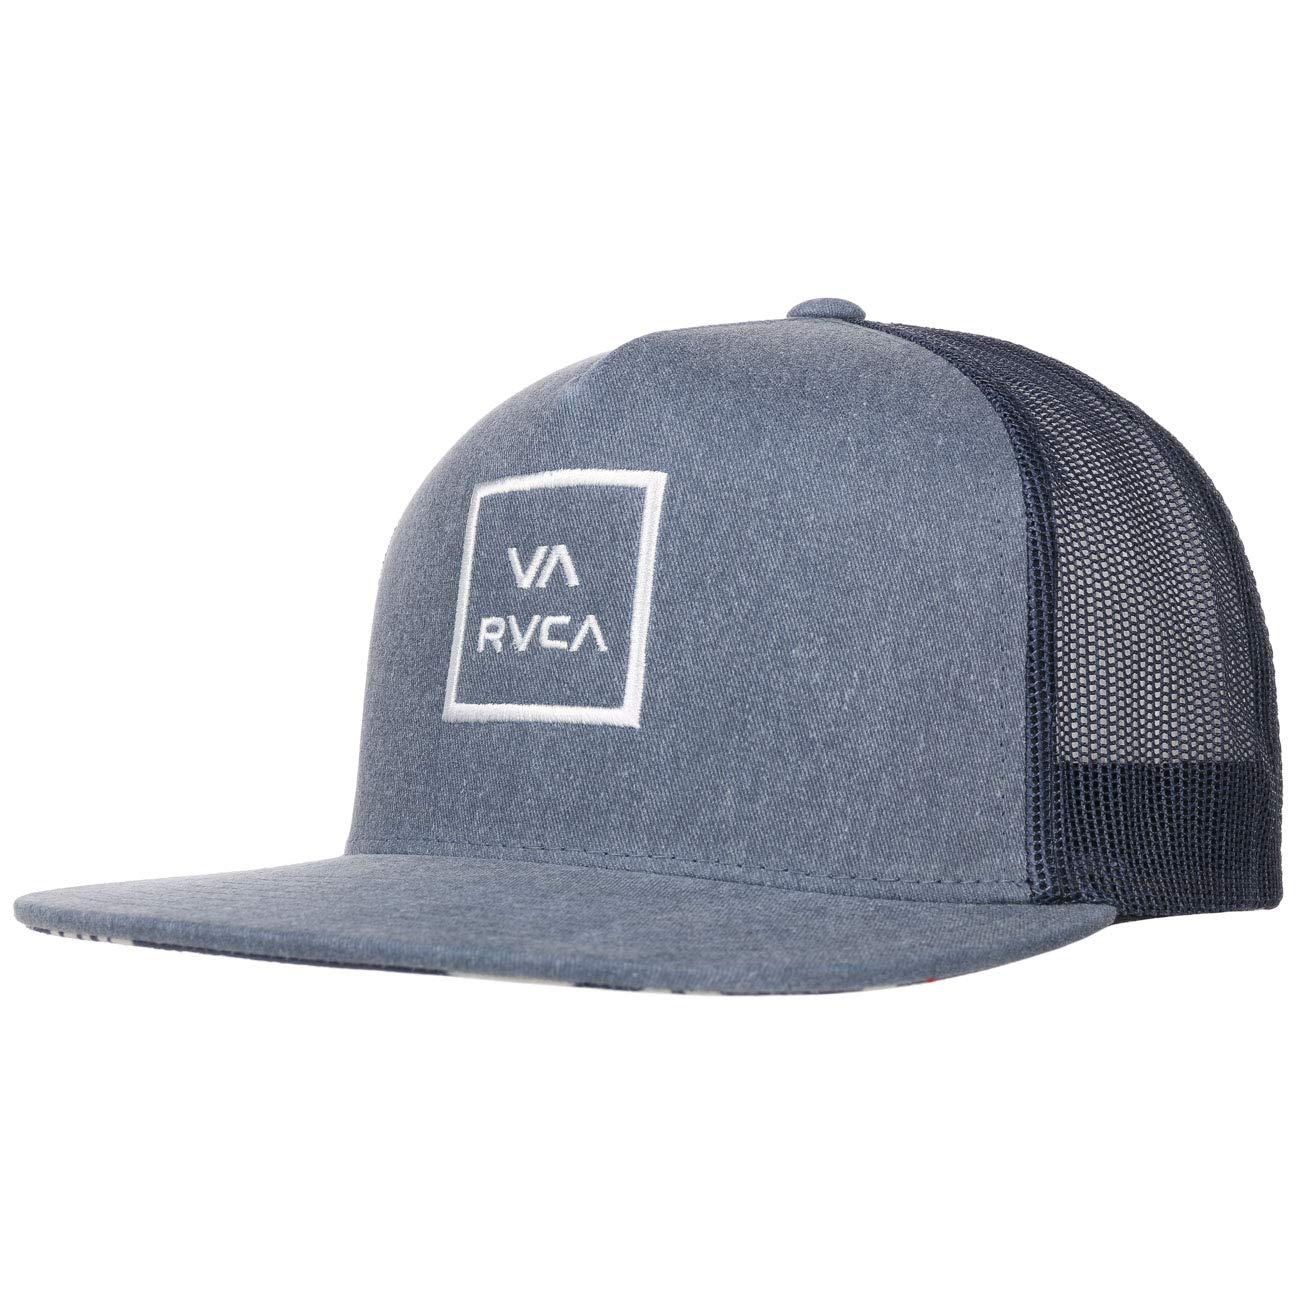 RVCA Gorra VA All The Way Trucker de Baseball (Talla única - Azul ...